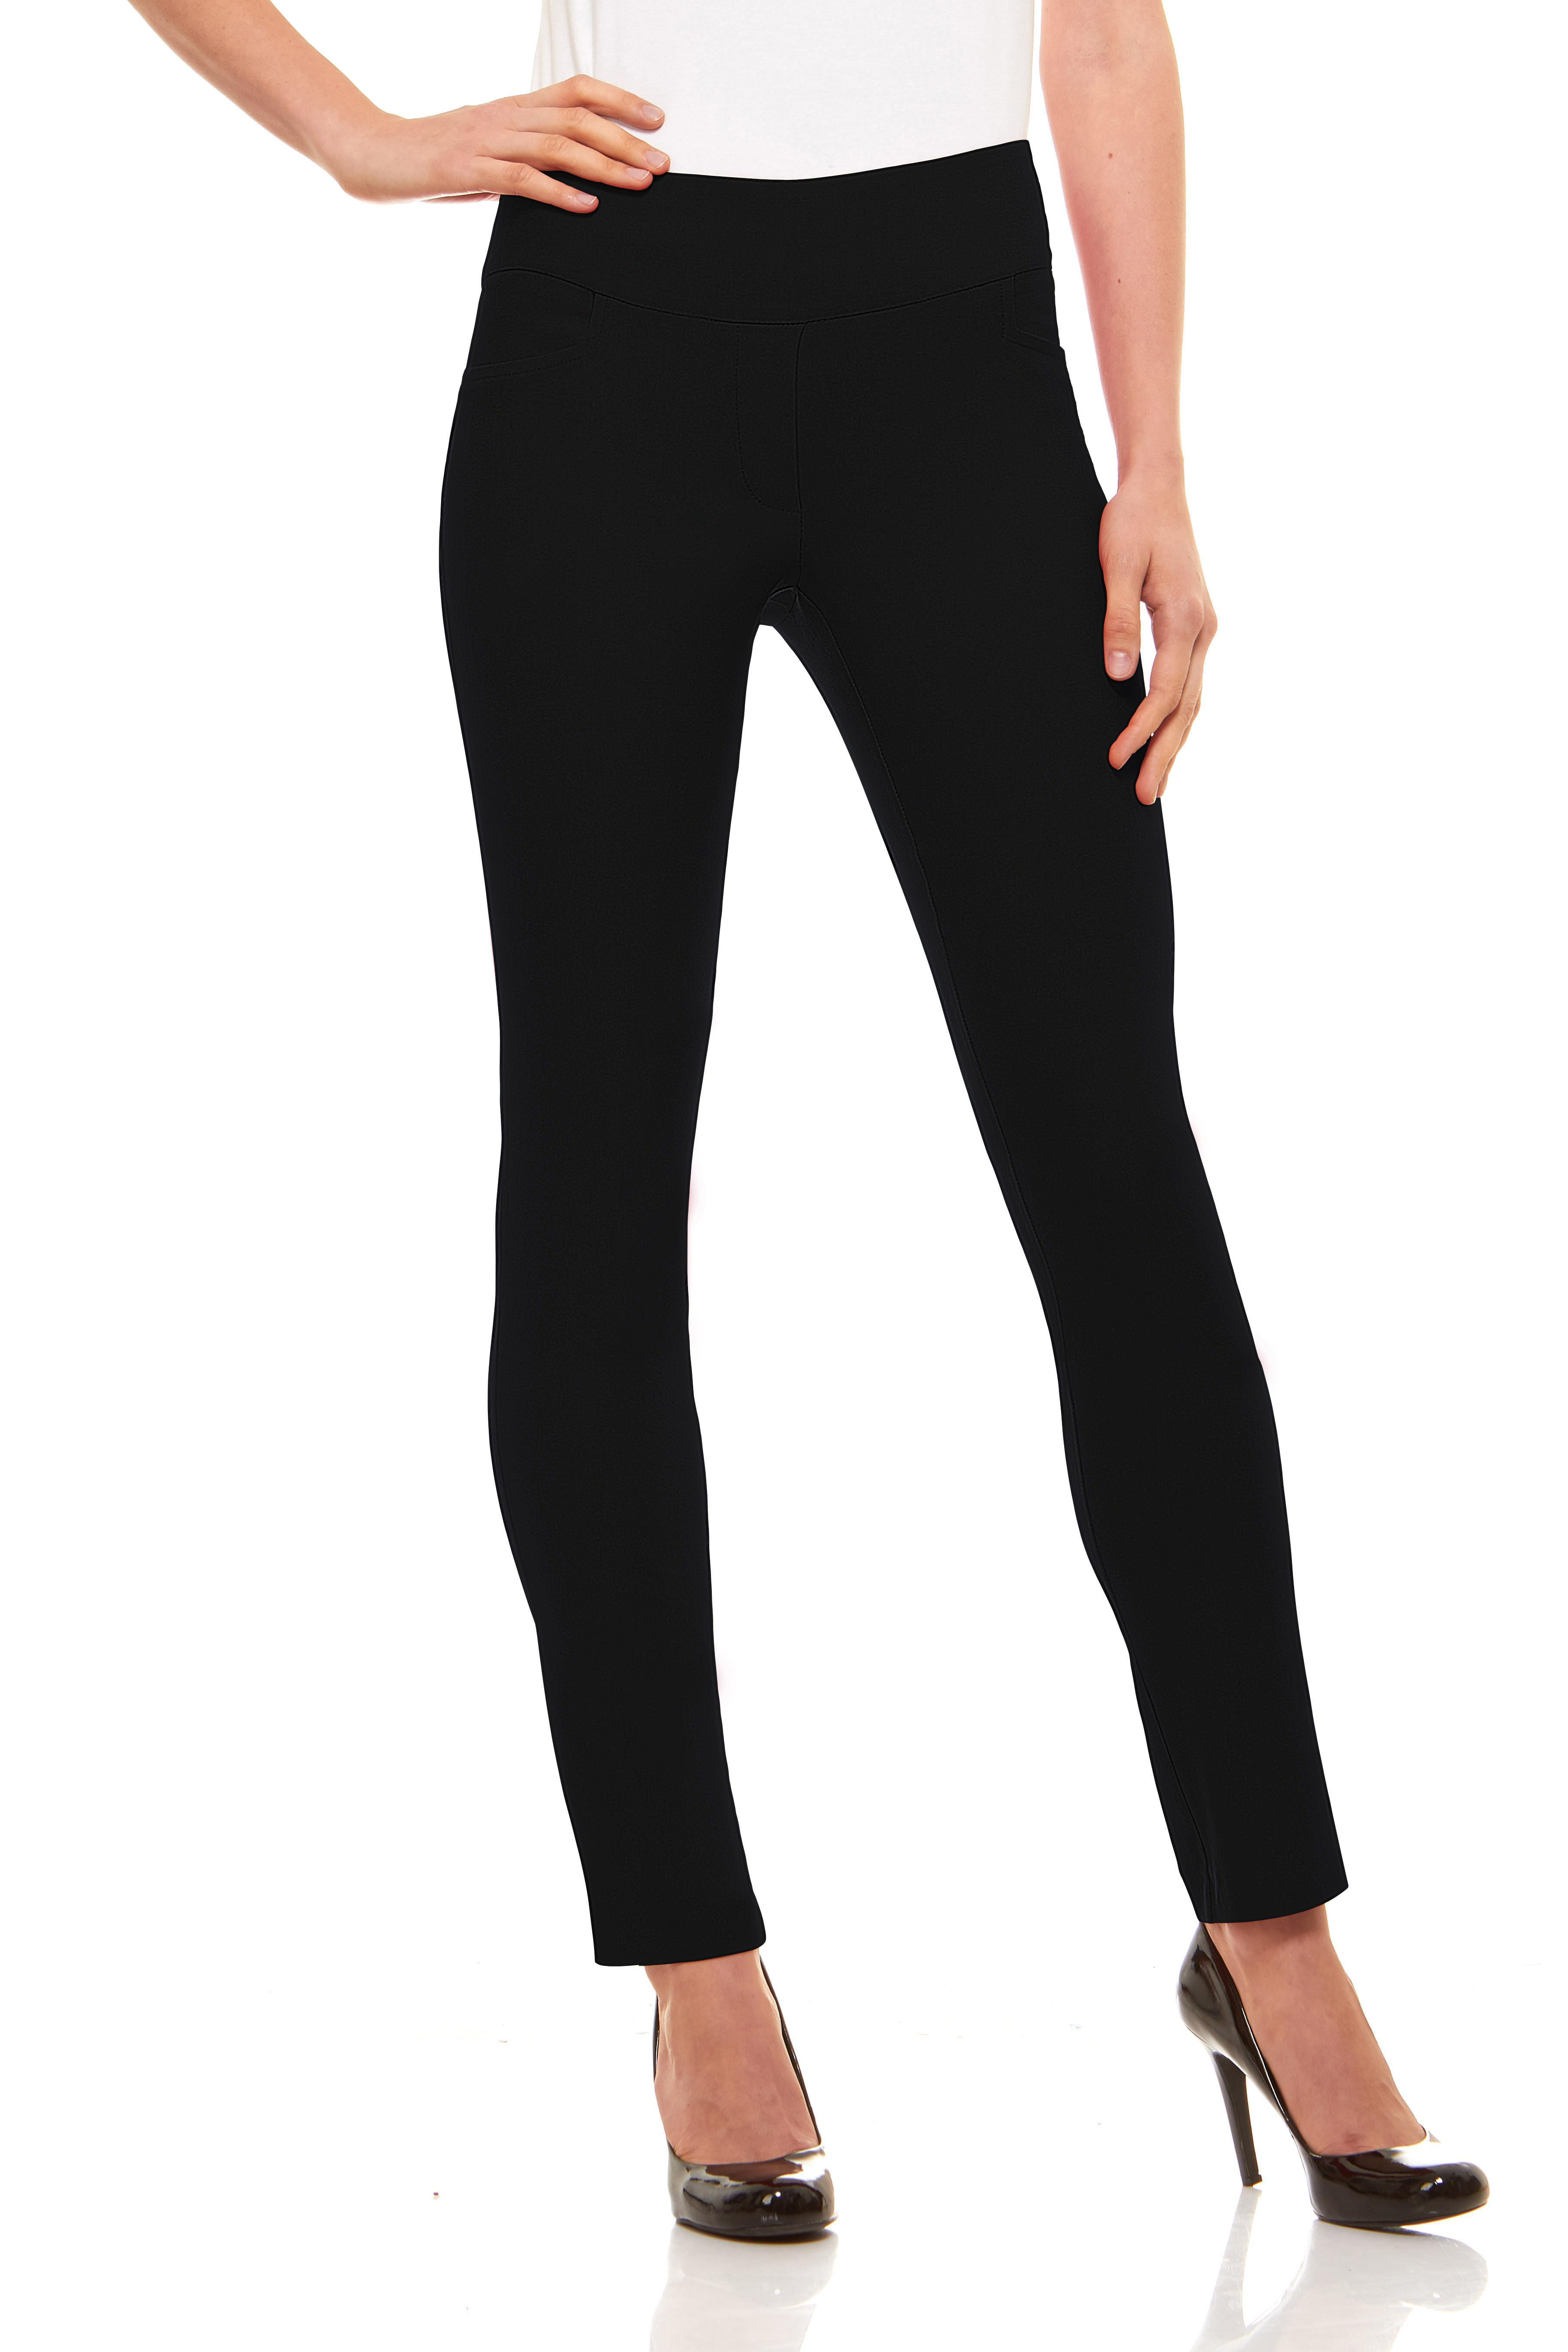 Womens Straight Leg Dress Pants Stretch Slim Fit Pull On